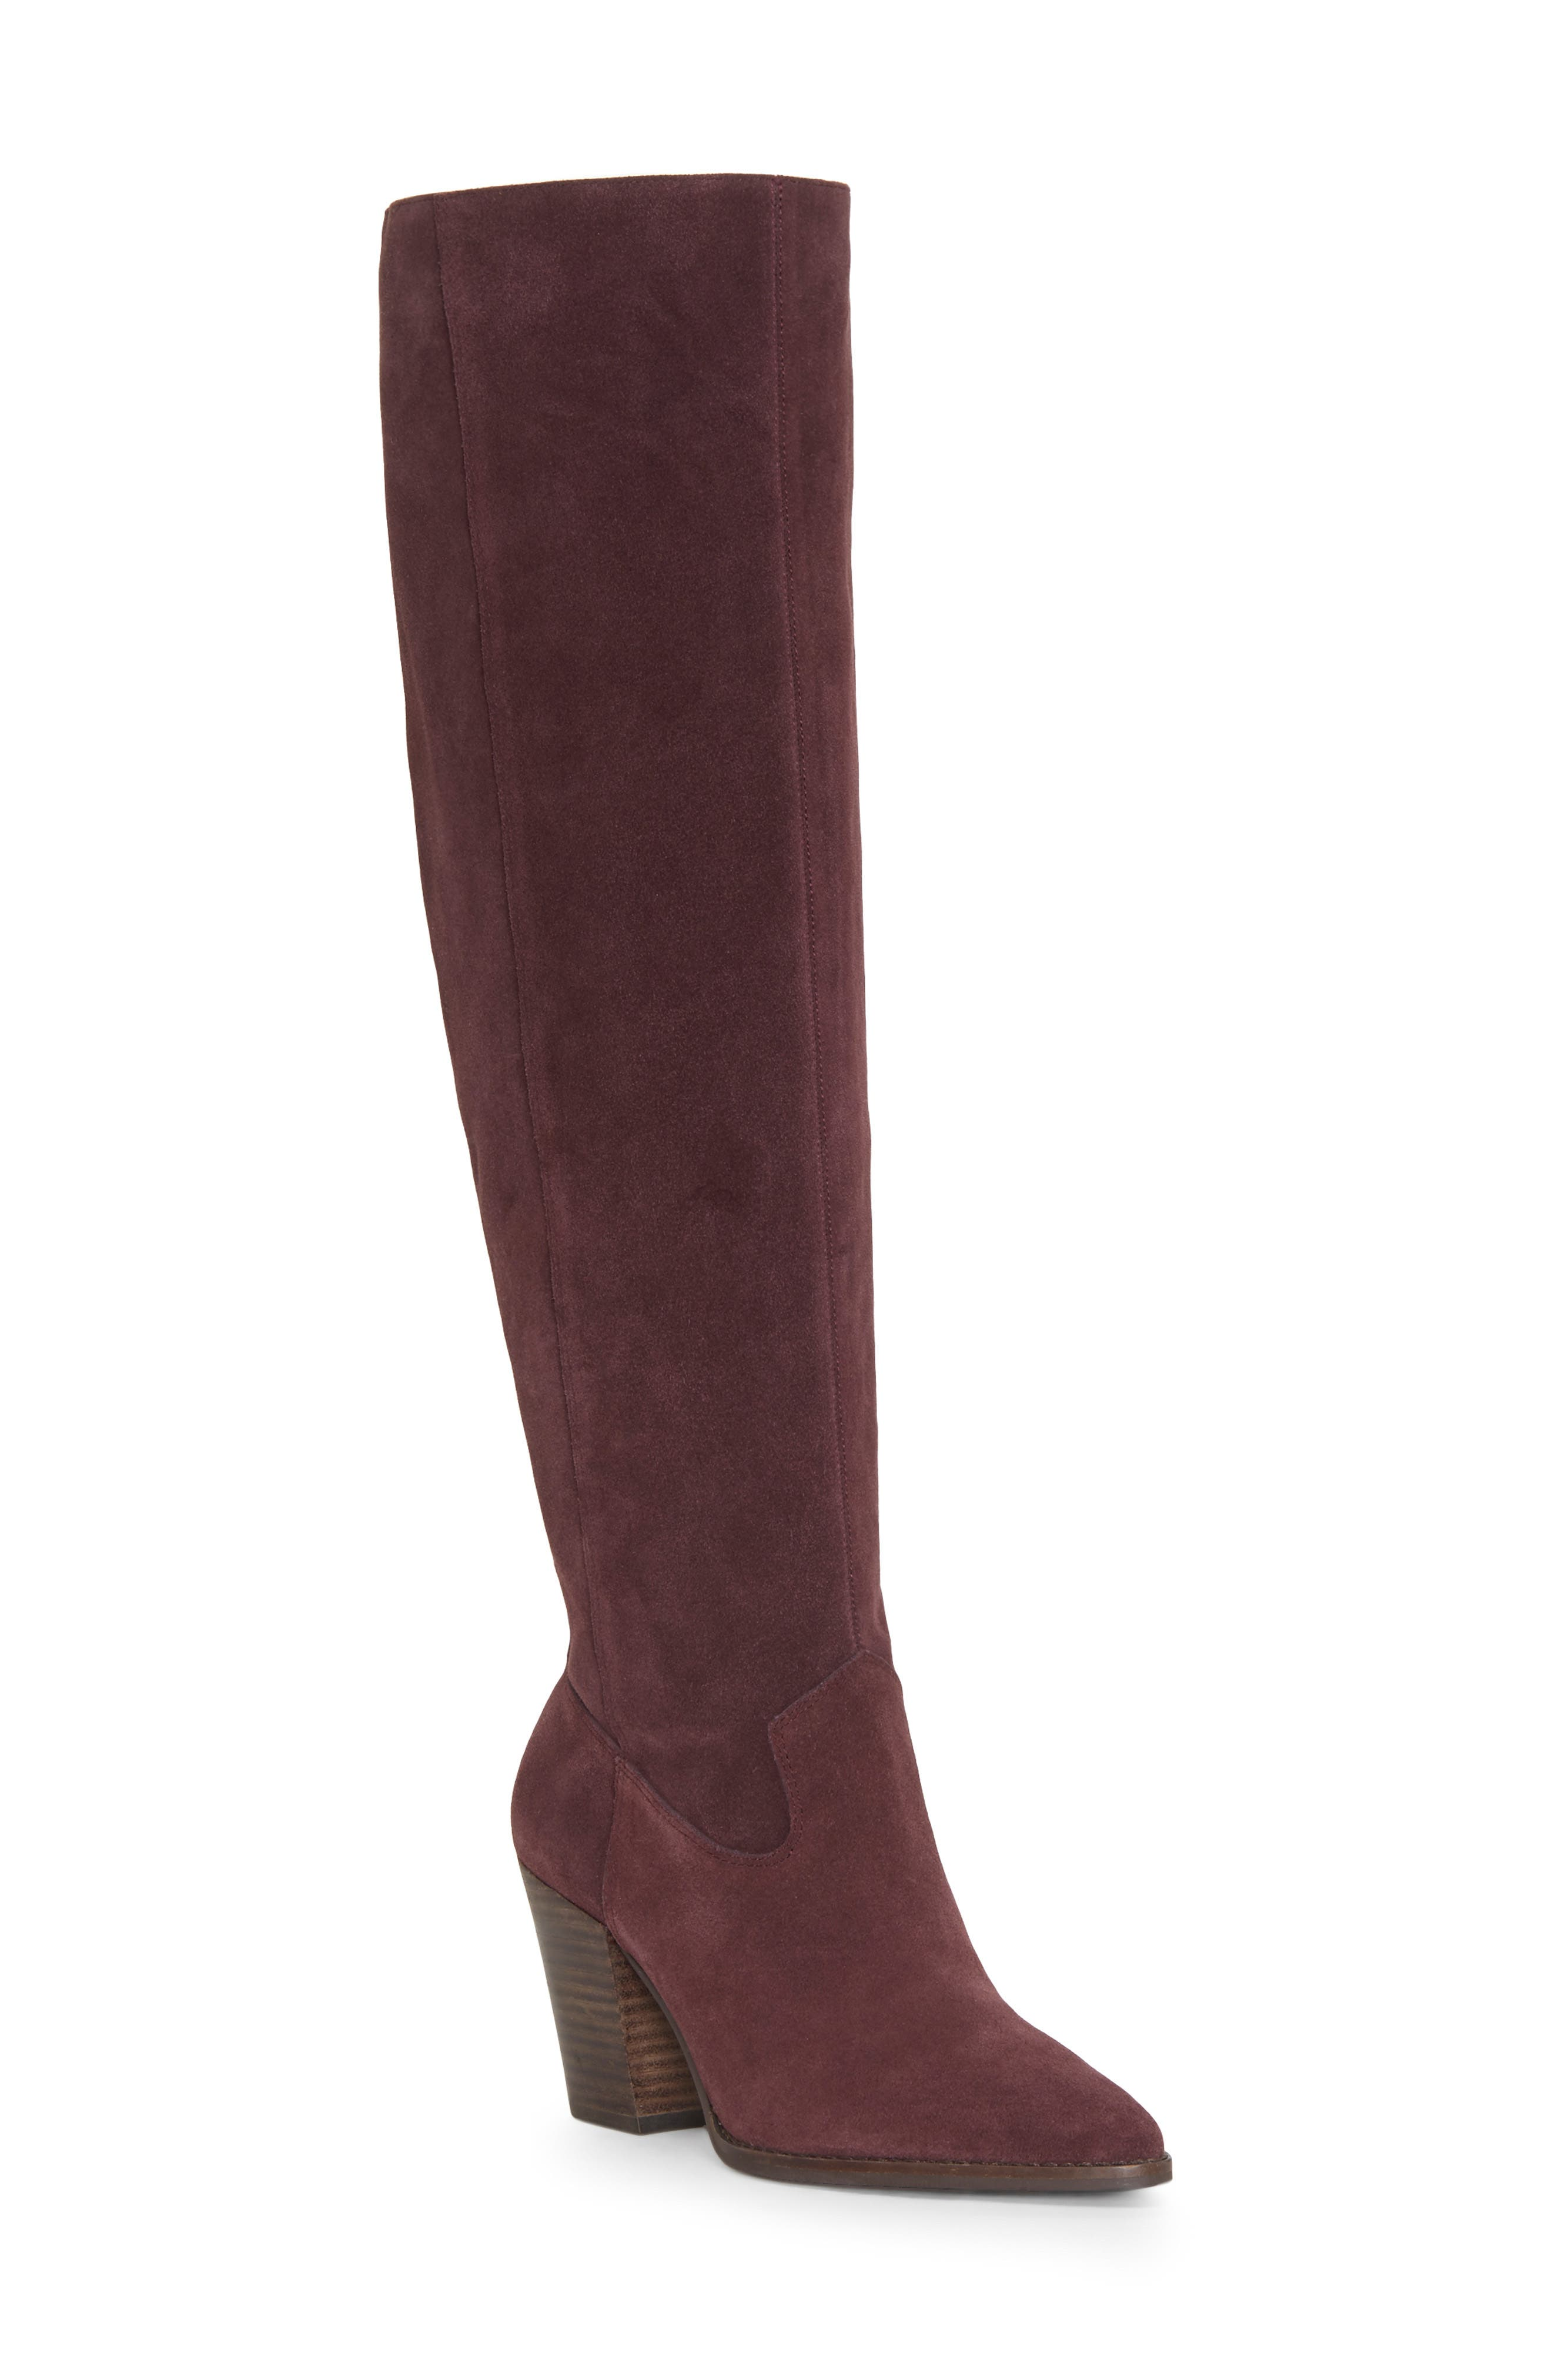 LUCKY BRAND,                             Azoola Knee High Boot,                             Main thumbnail 1, color,                             RAISIN SUEDE